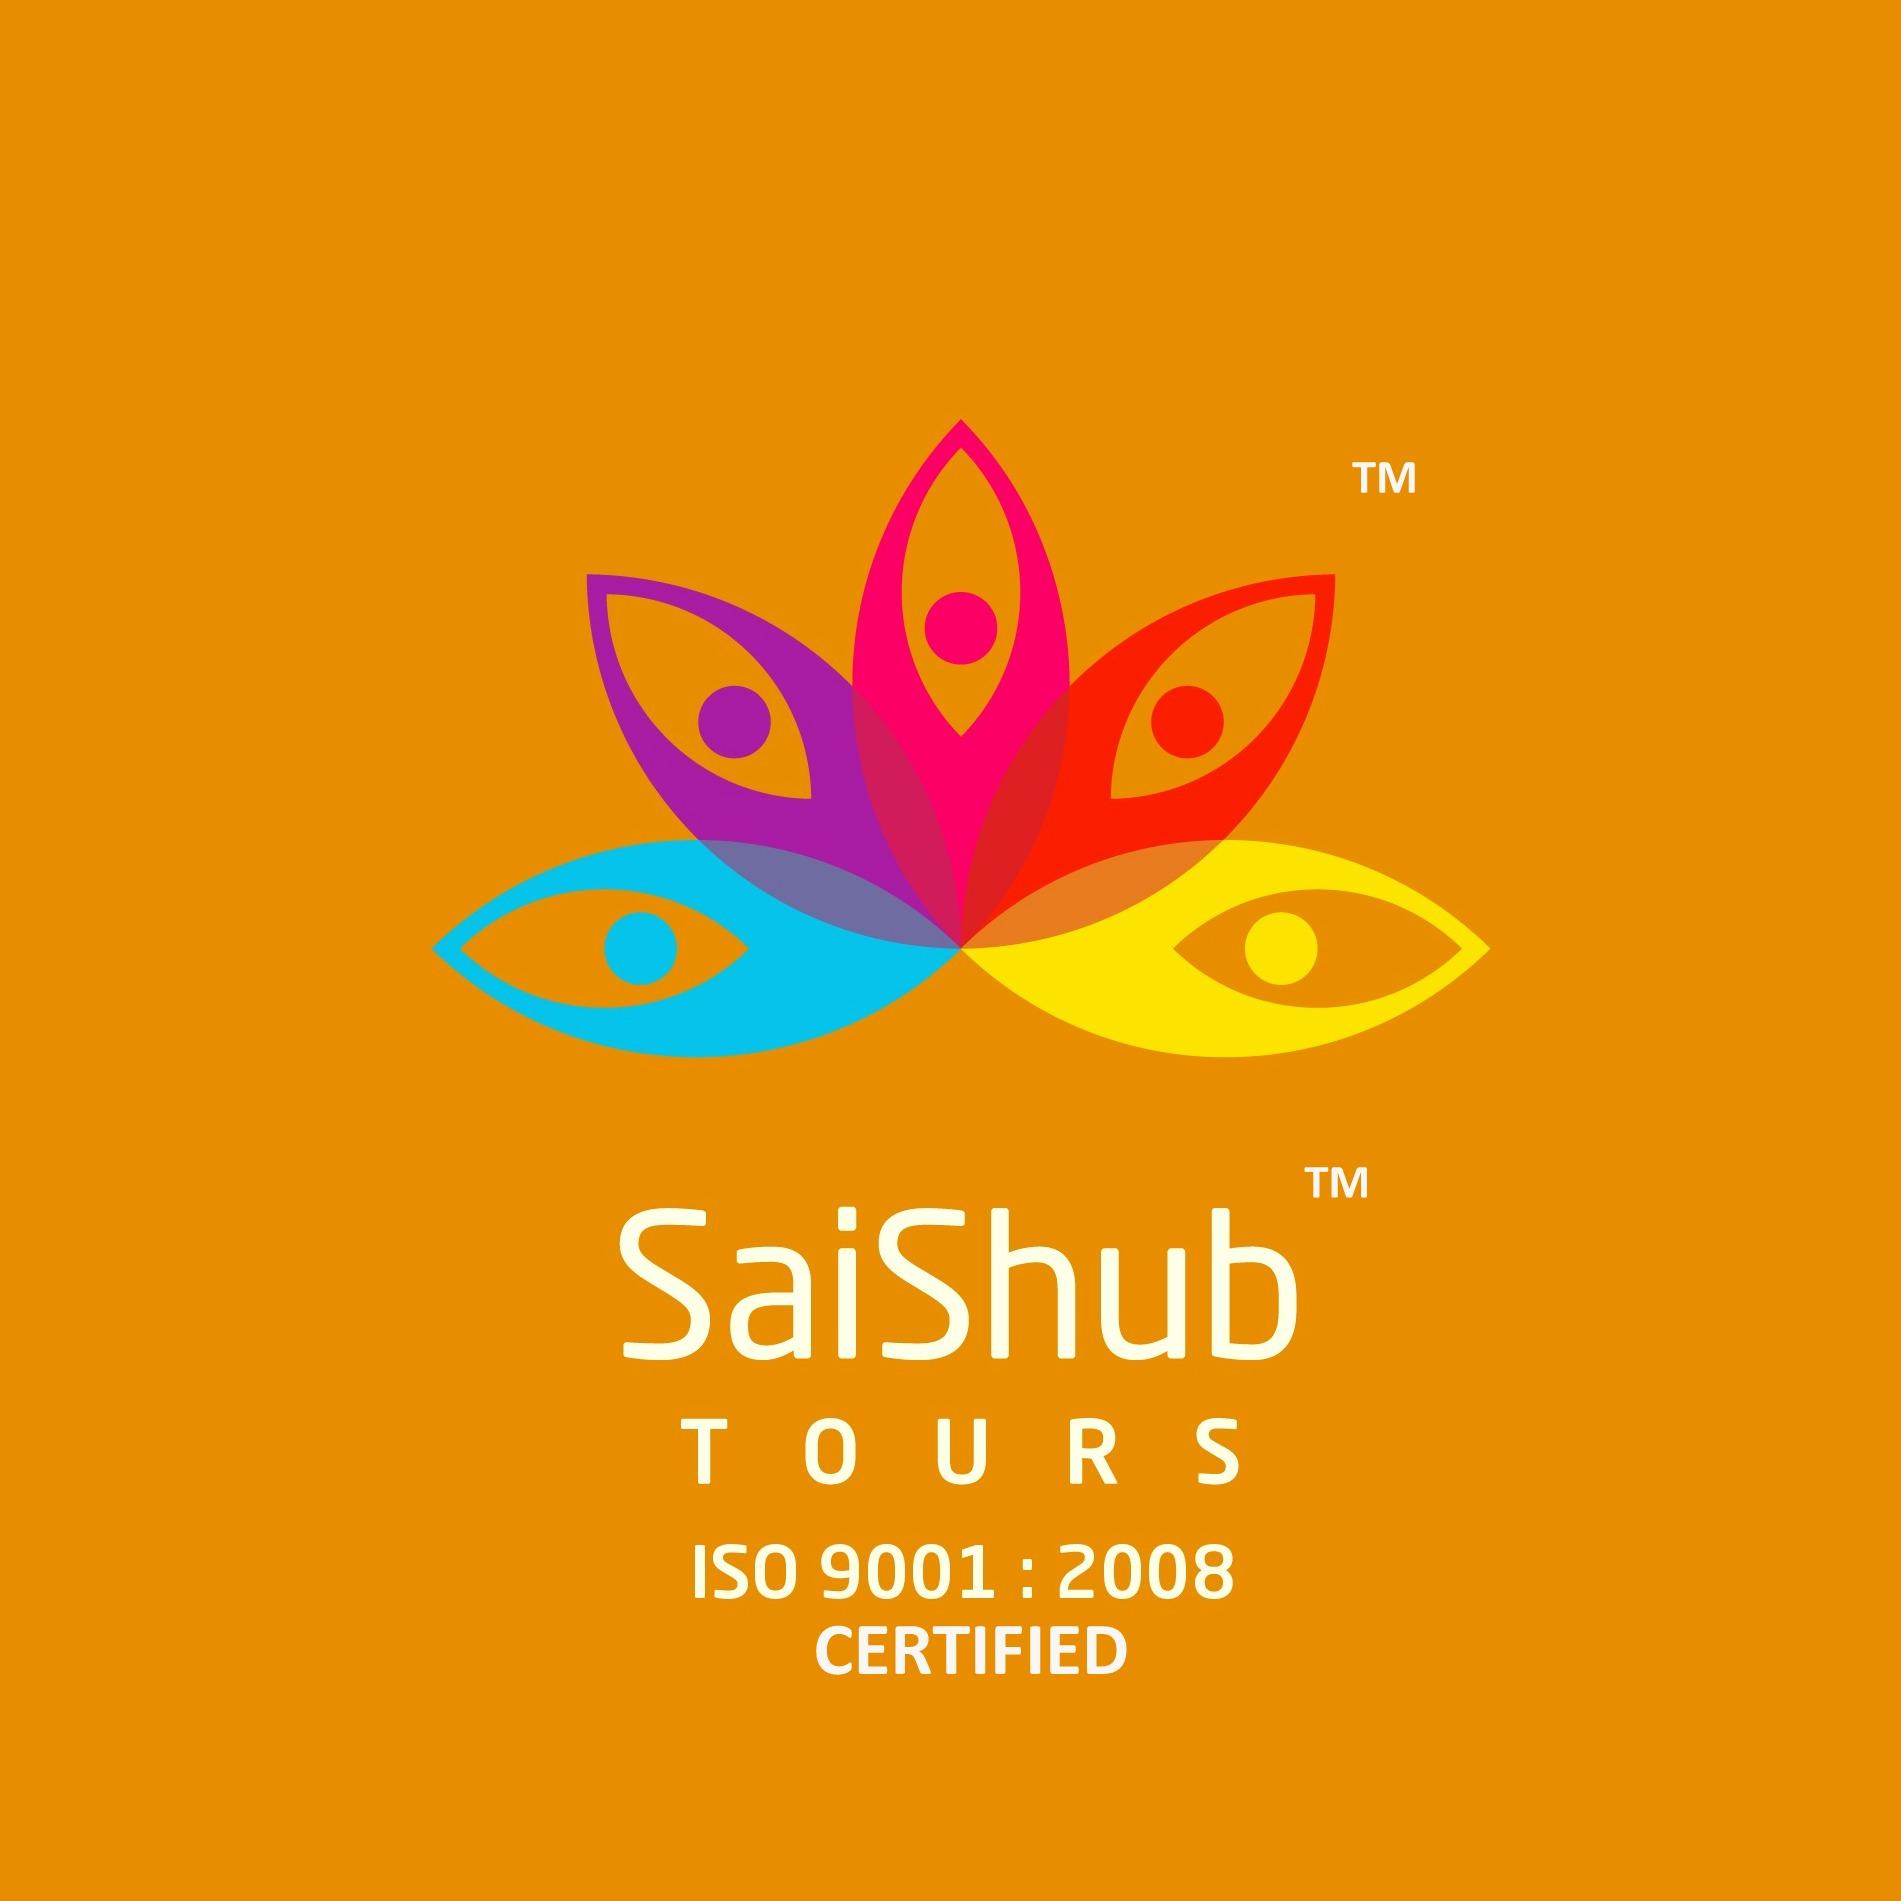 SAISHUB TOURS Job Openings